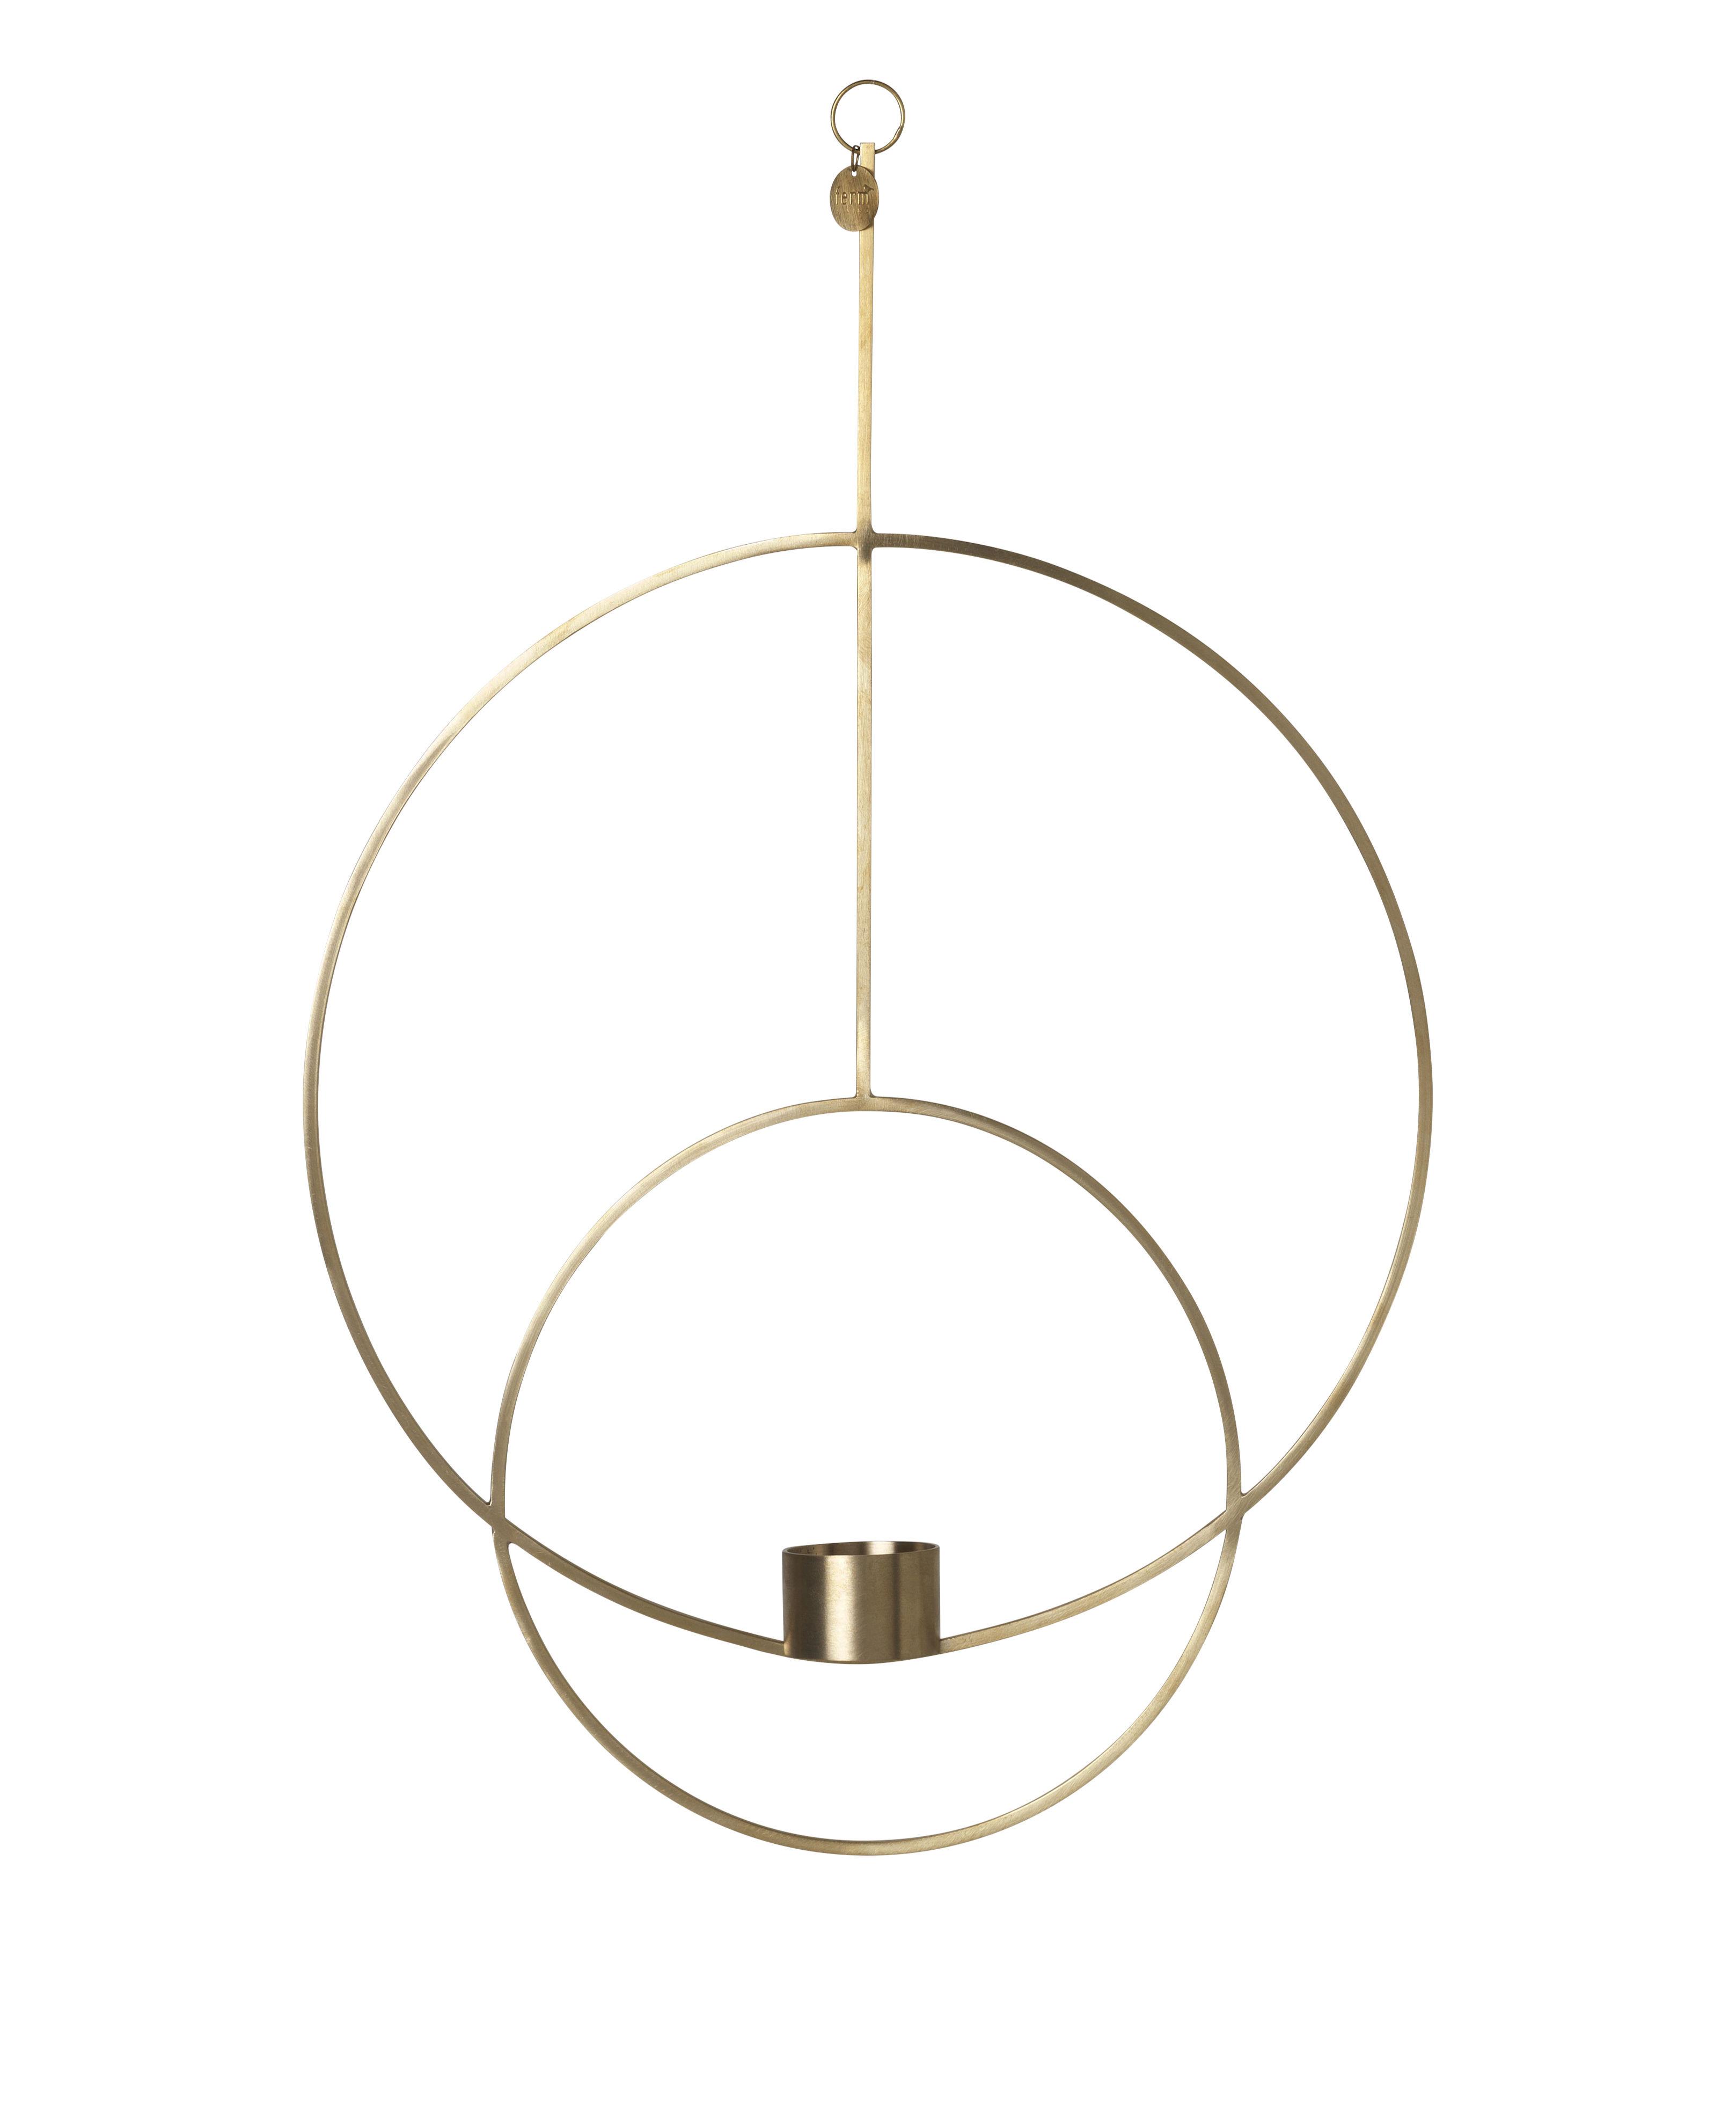 Dekoration - Kerzen, Kerzenleuchter und Windlichter - Circular Kerzenhalter zum Aufhängen / L 30 cm x H 45 cm - Ferm Living - Messing - Laiton massif